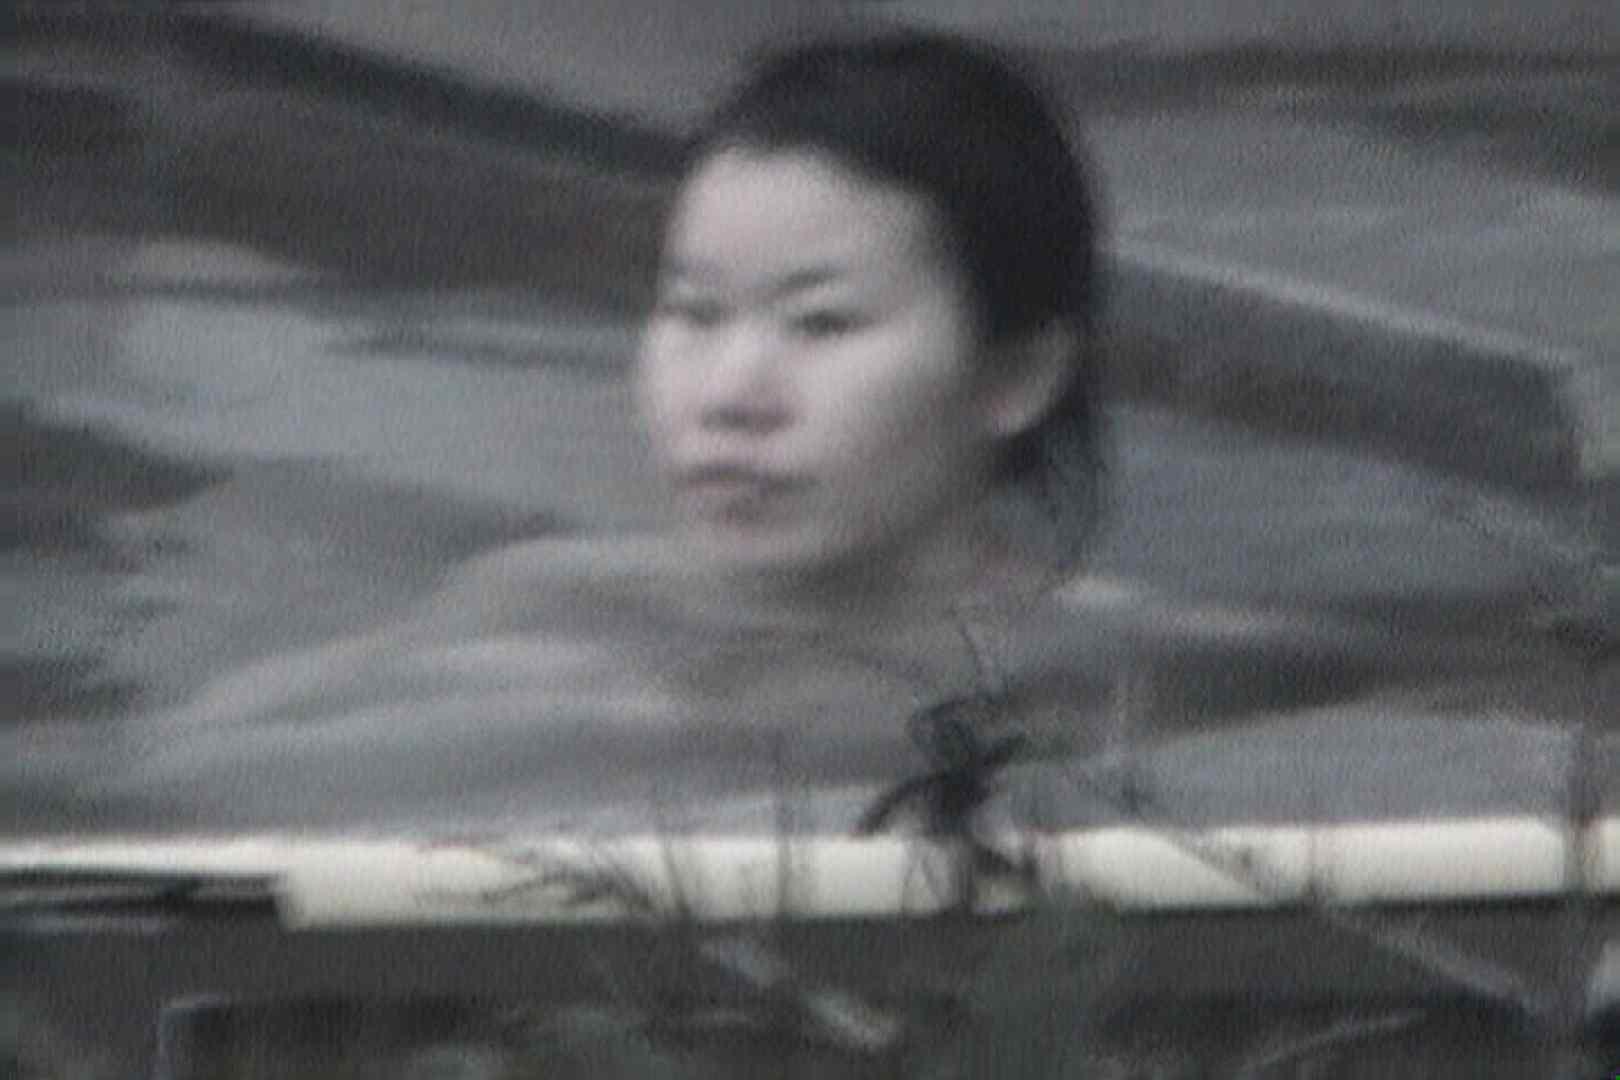 Aquaな露天風呂Vol.556 露天風呂編 | 盗撮シリーズ  99PIX 91